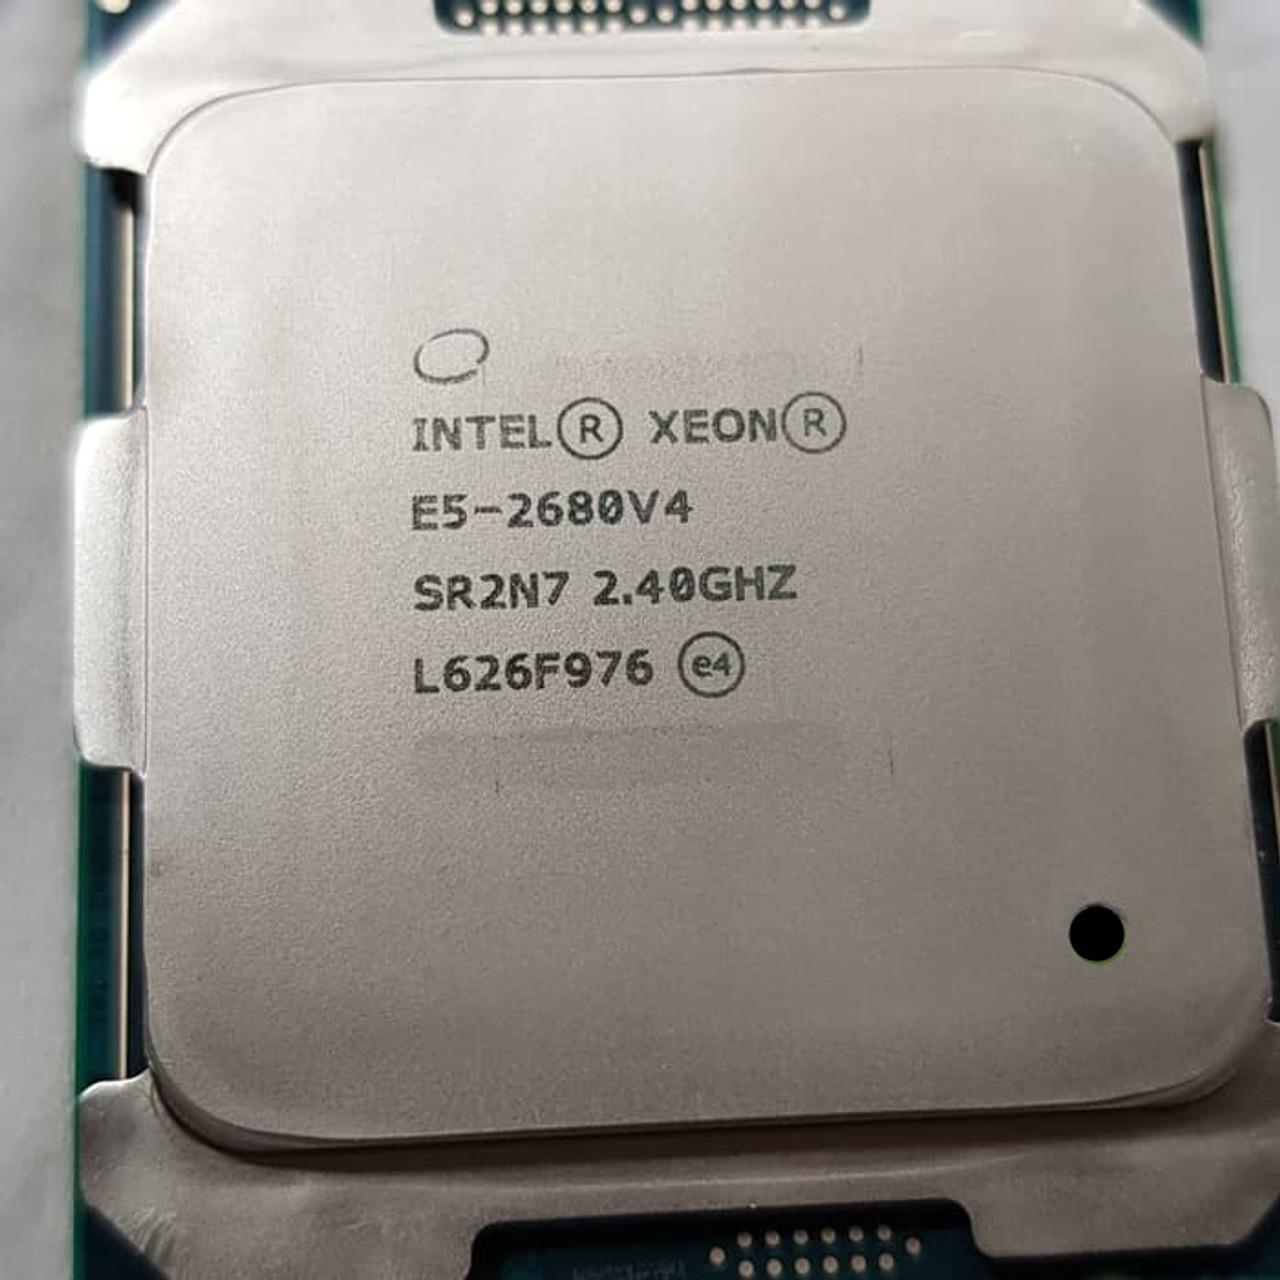 Intel Xeon SR2N7 14Core E5-2680 V4 2.4Ghz 35M Processor